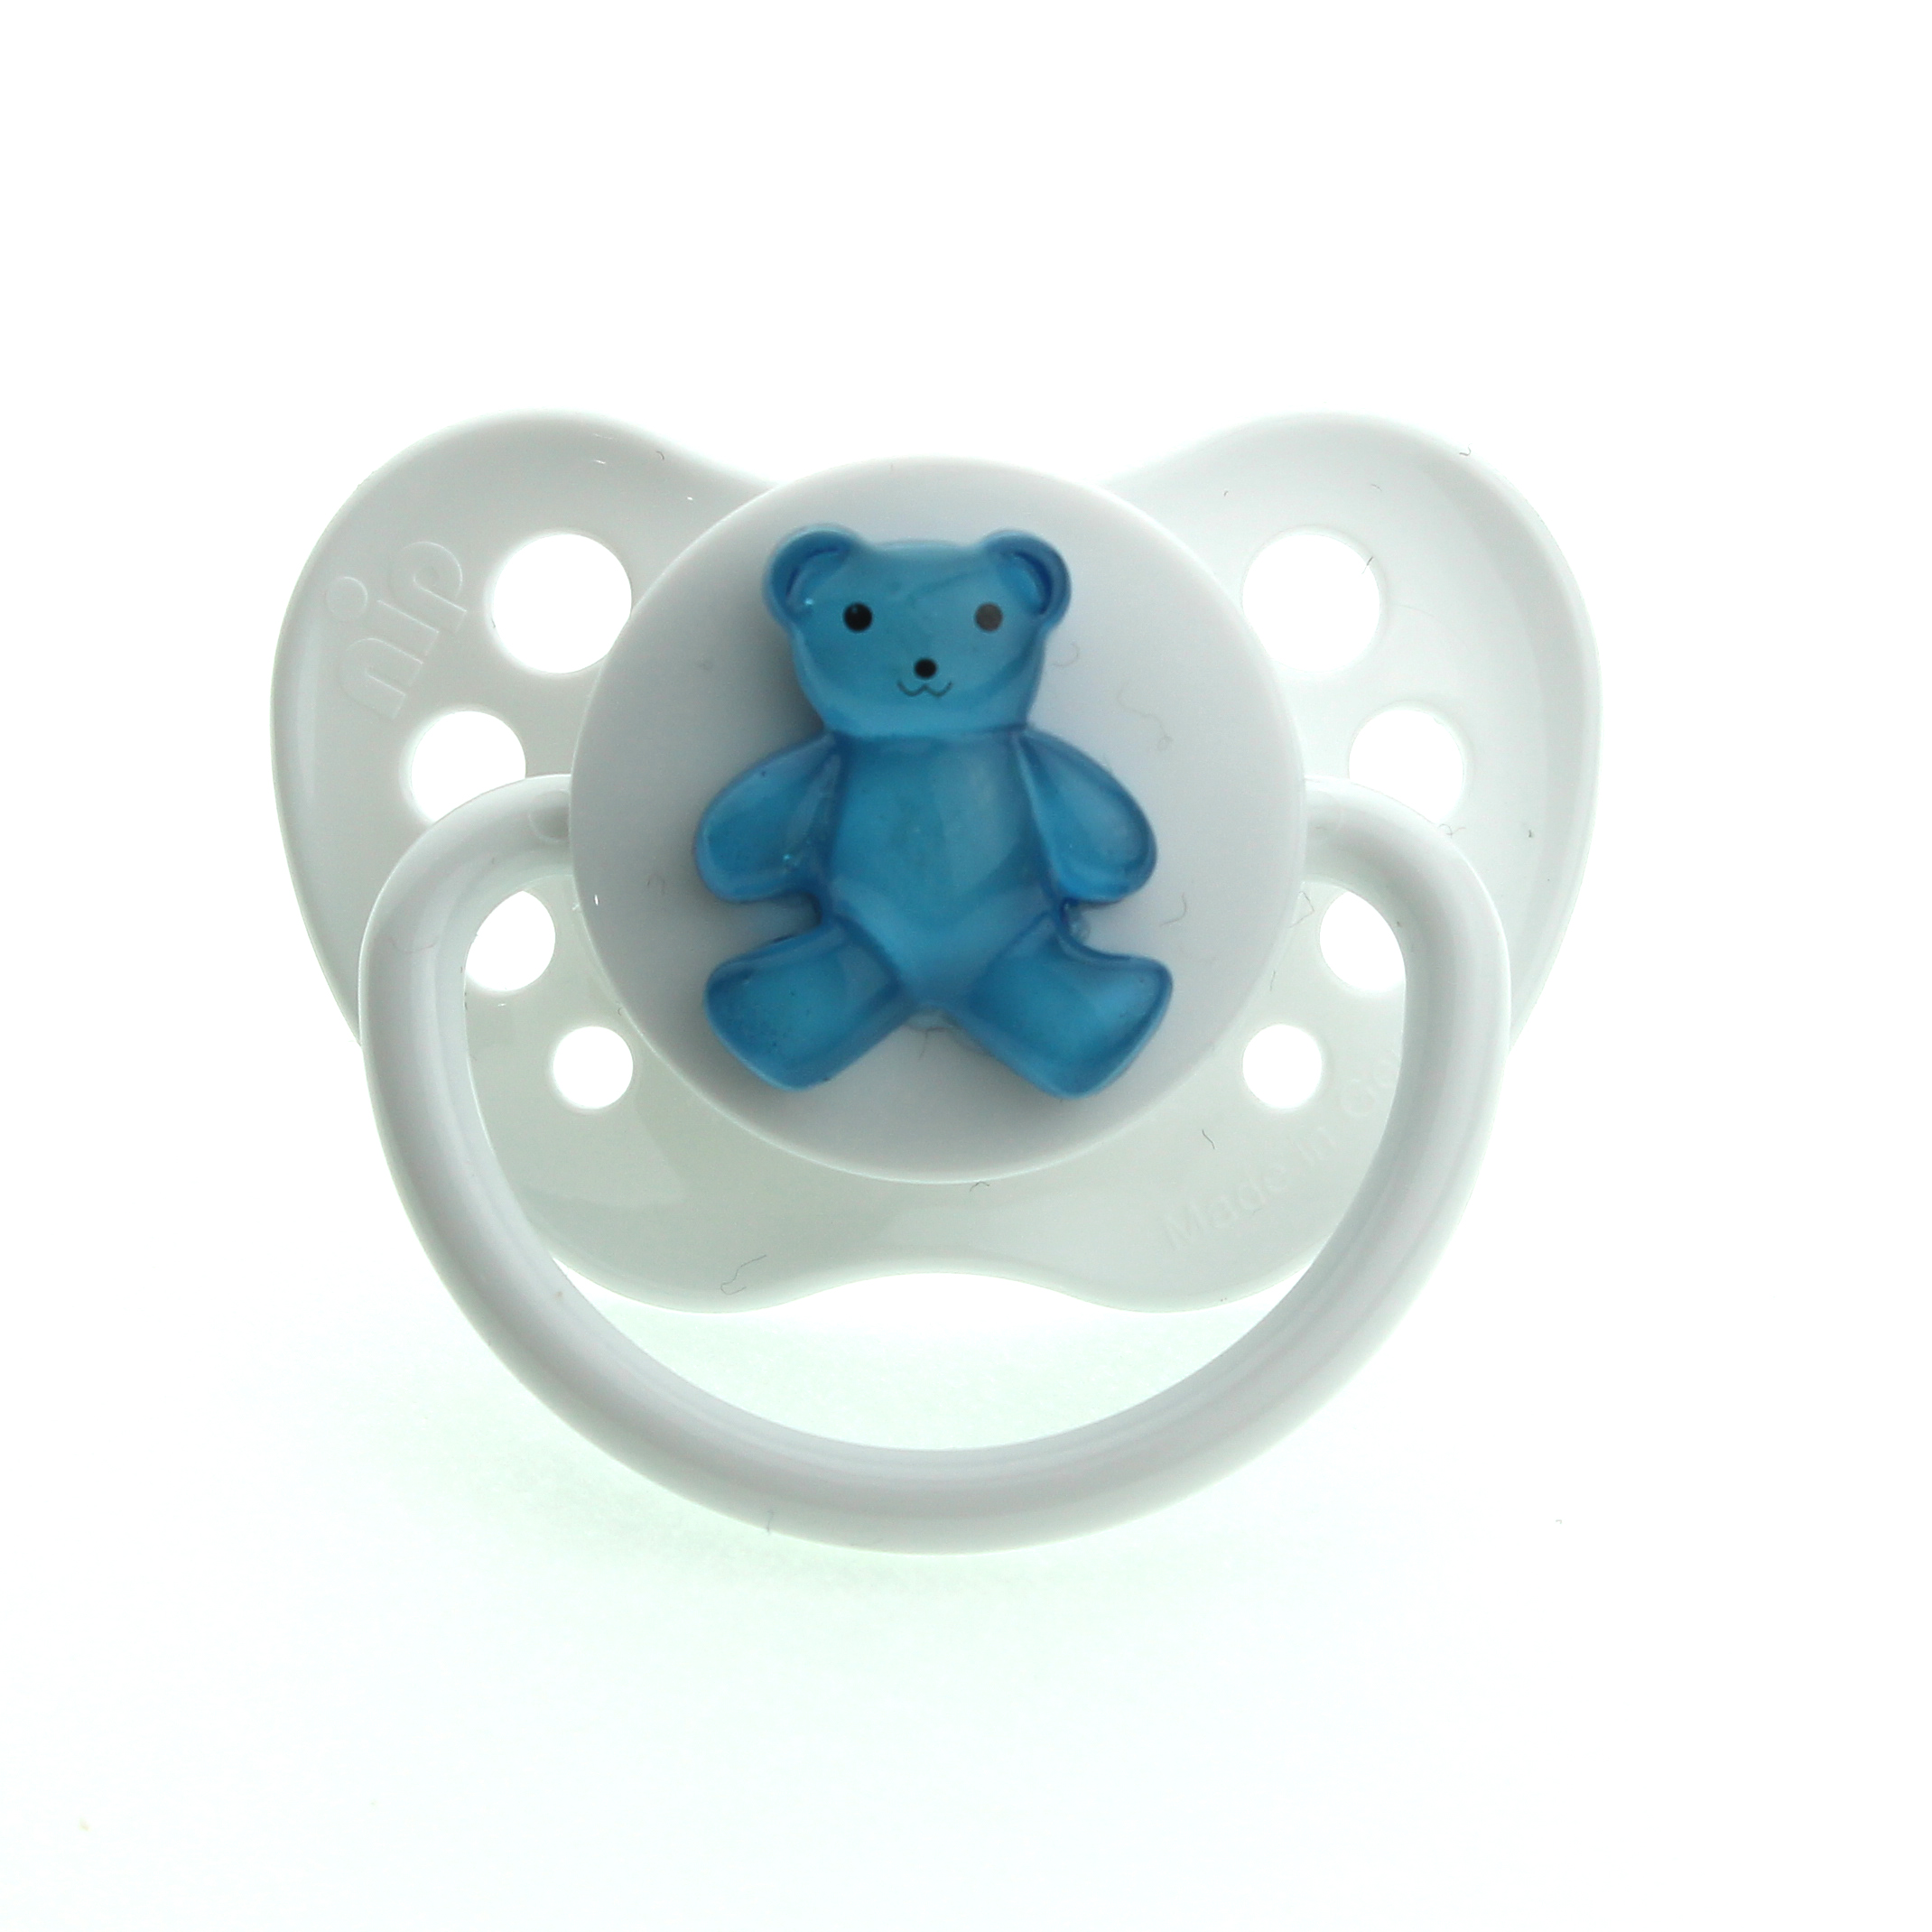 Teddy Bear Pacifier by Crystal Dream